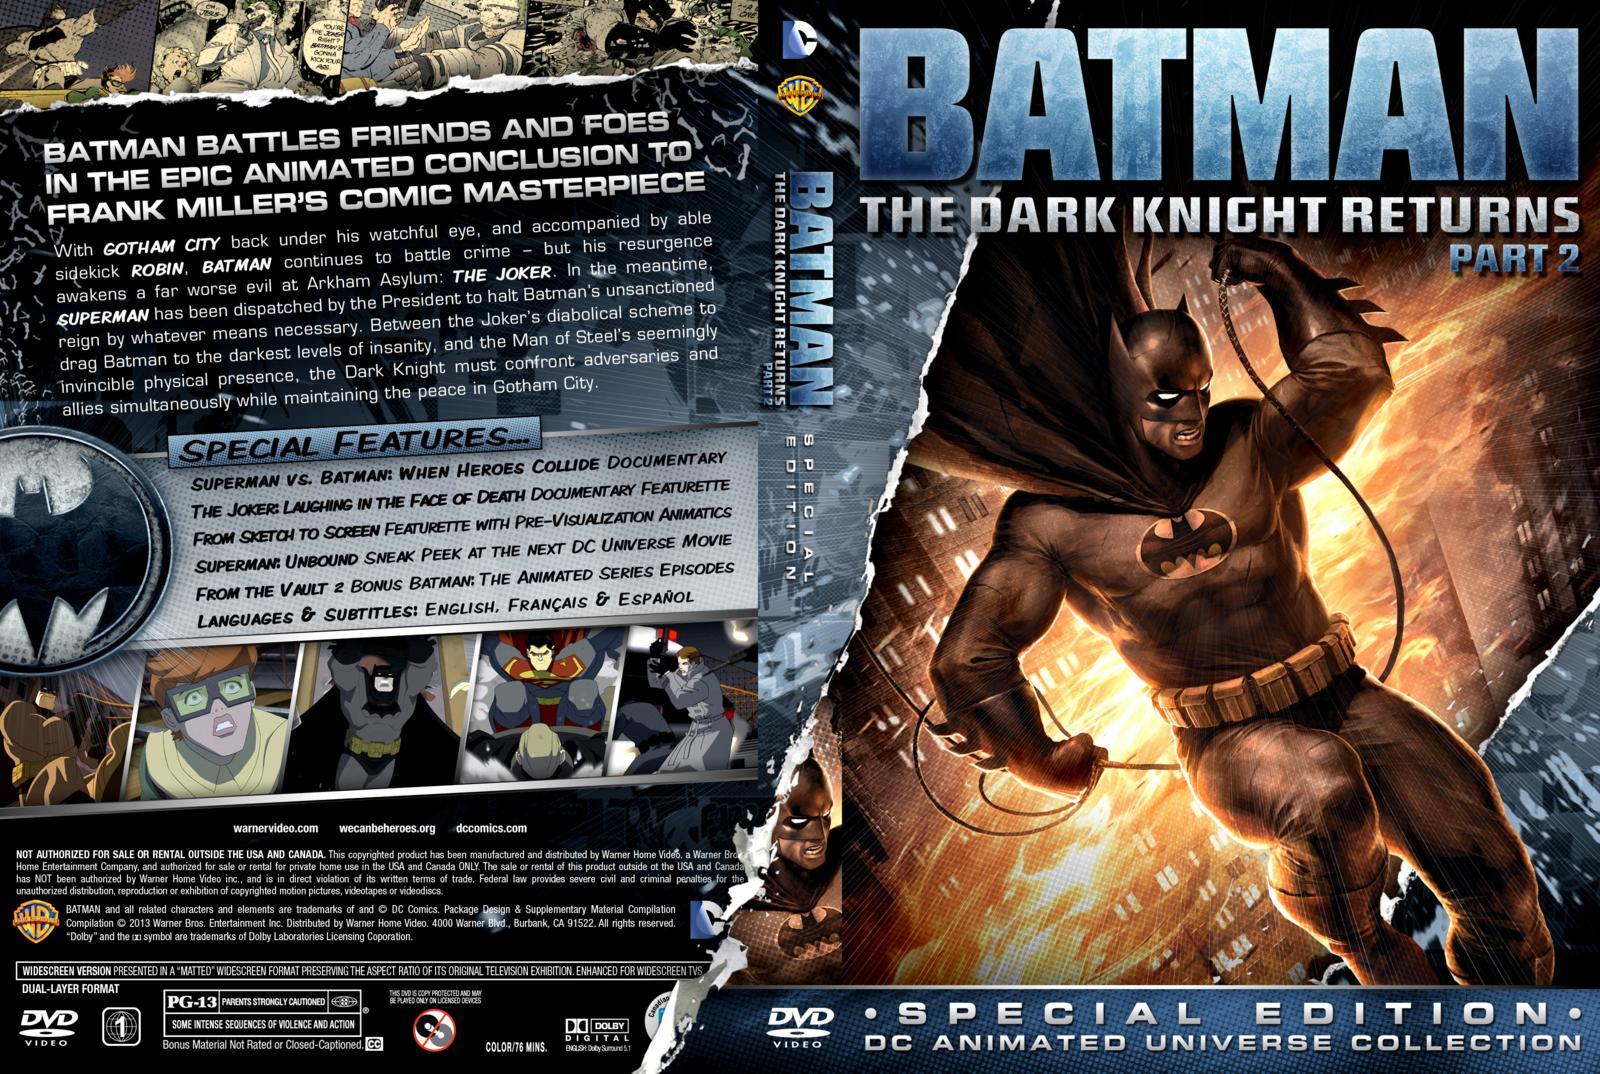 capa dvd batman the dark knight returns part 2 gamecover